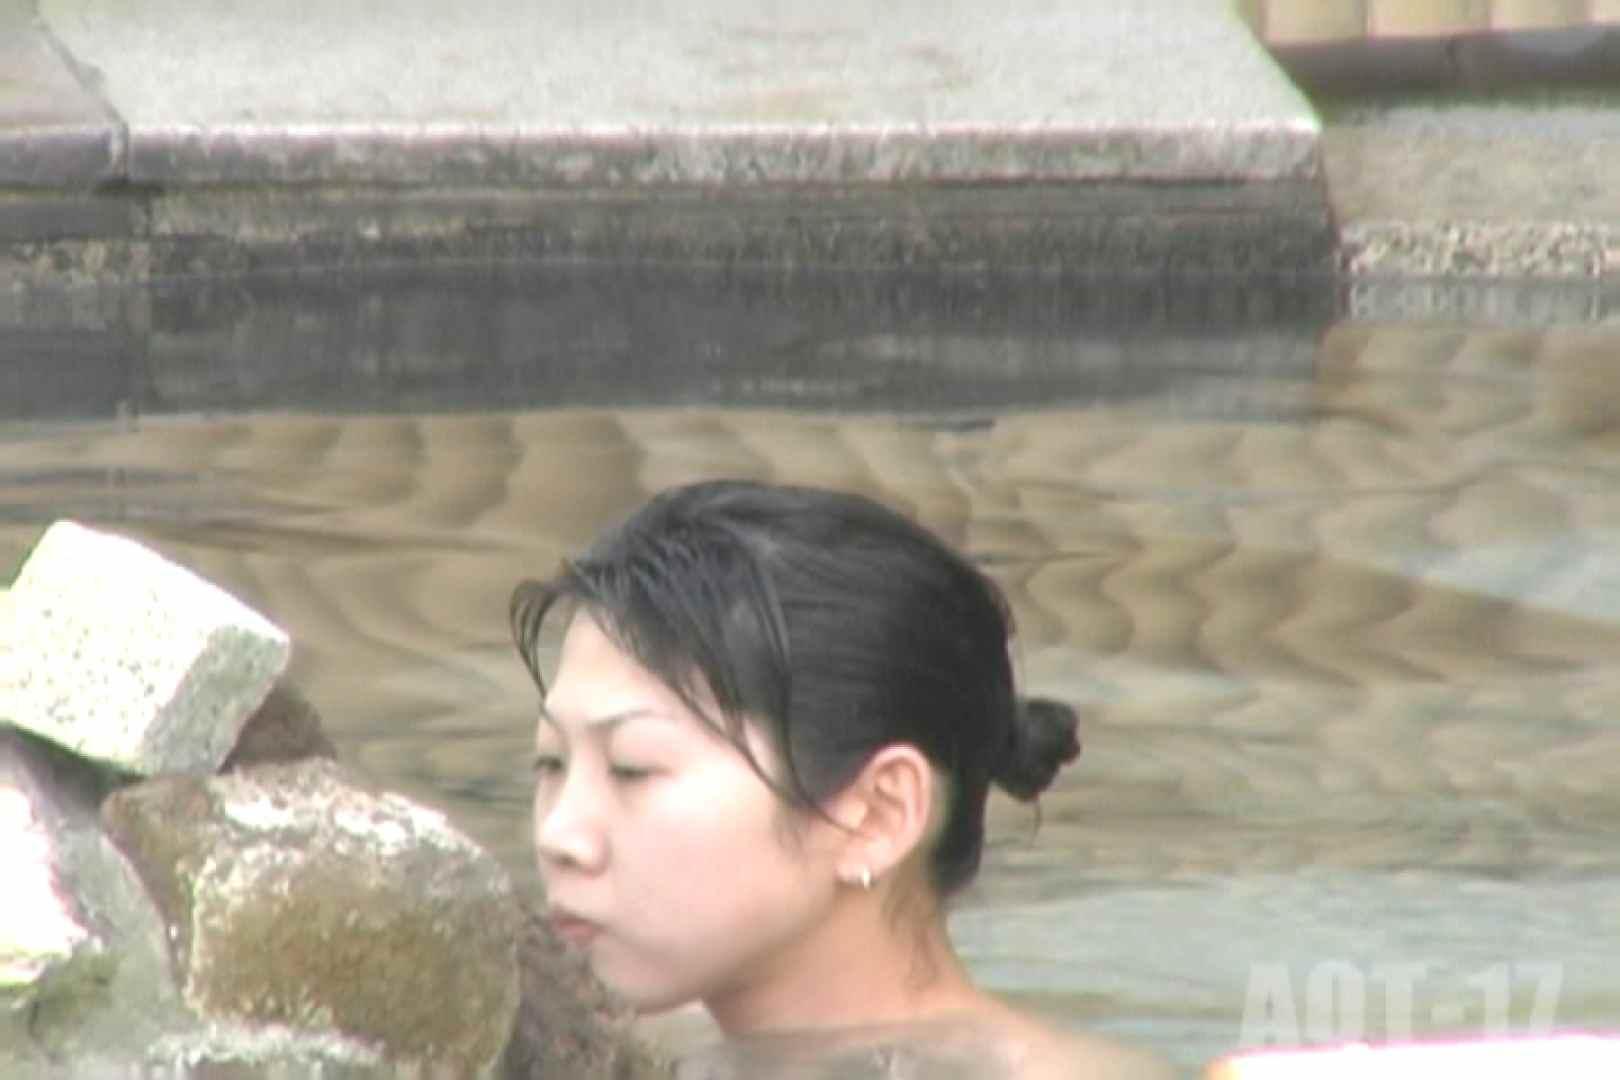 Aquaな露天風呂Vol.850 露天 | HなOL  79pic 44